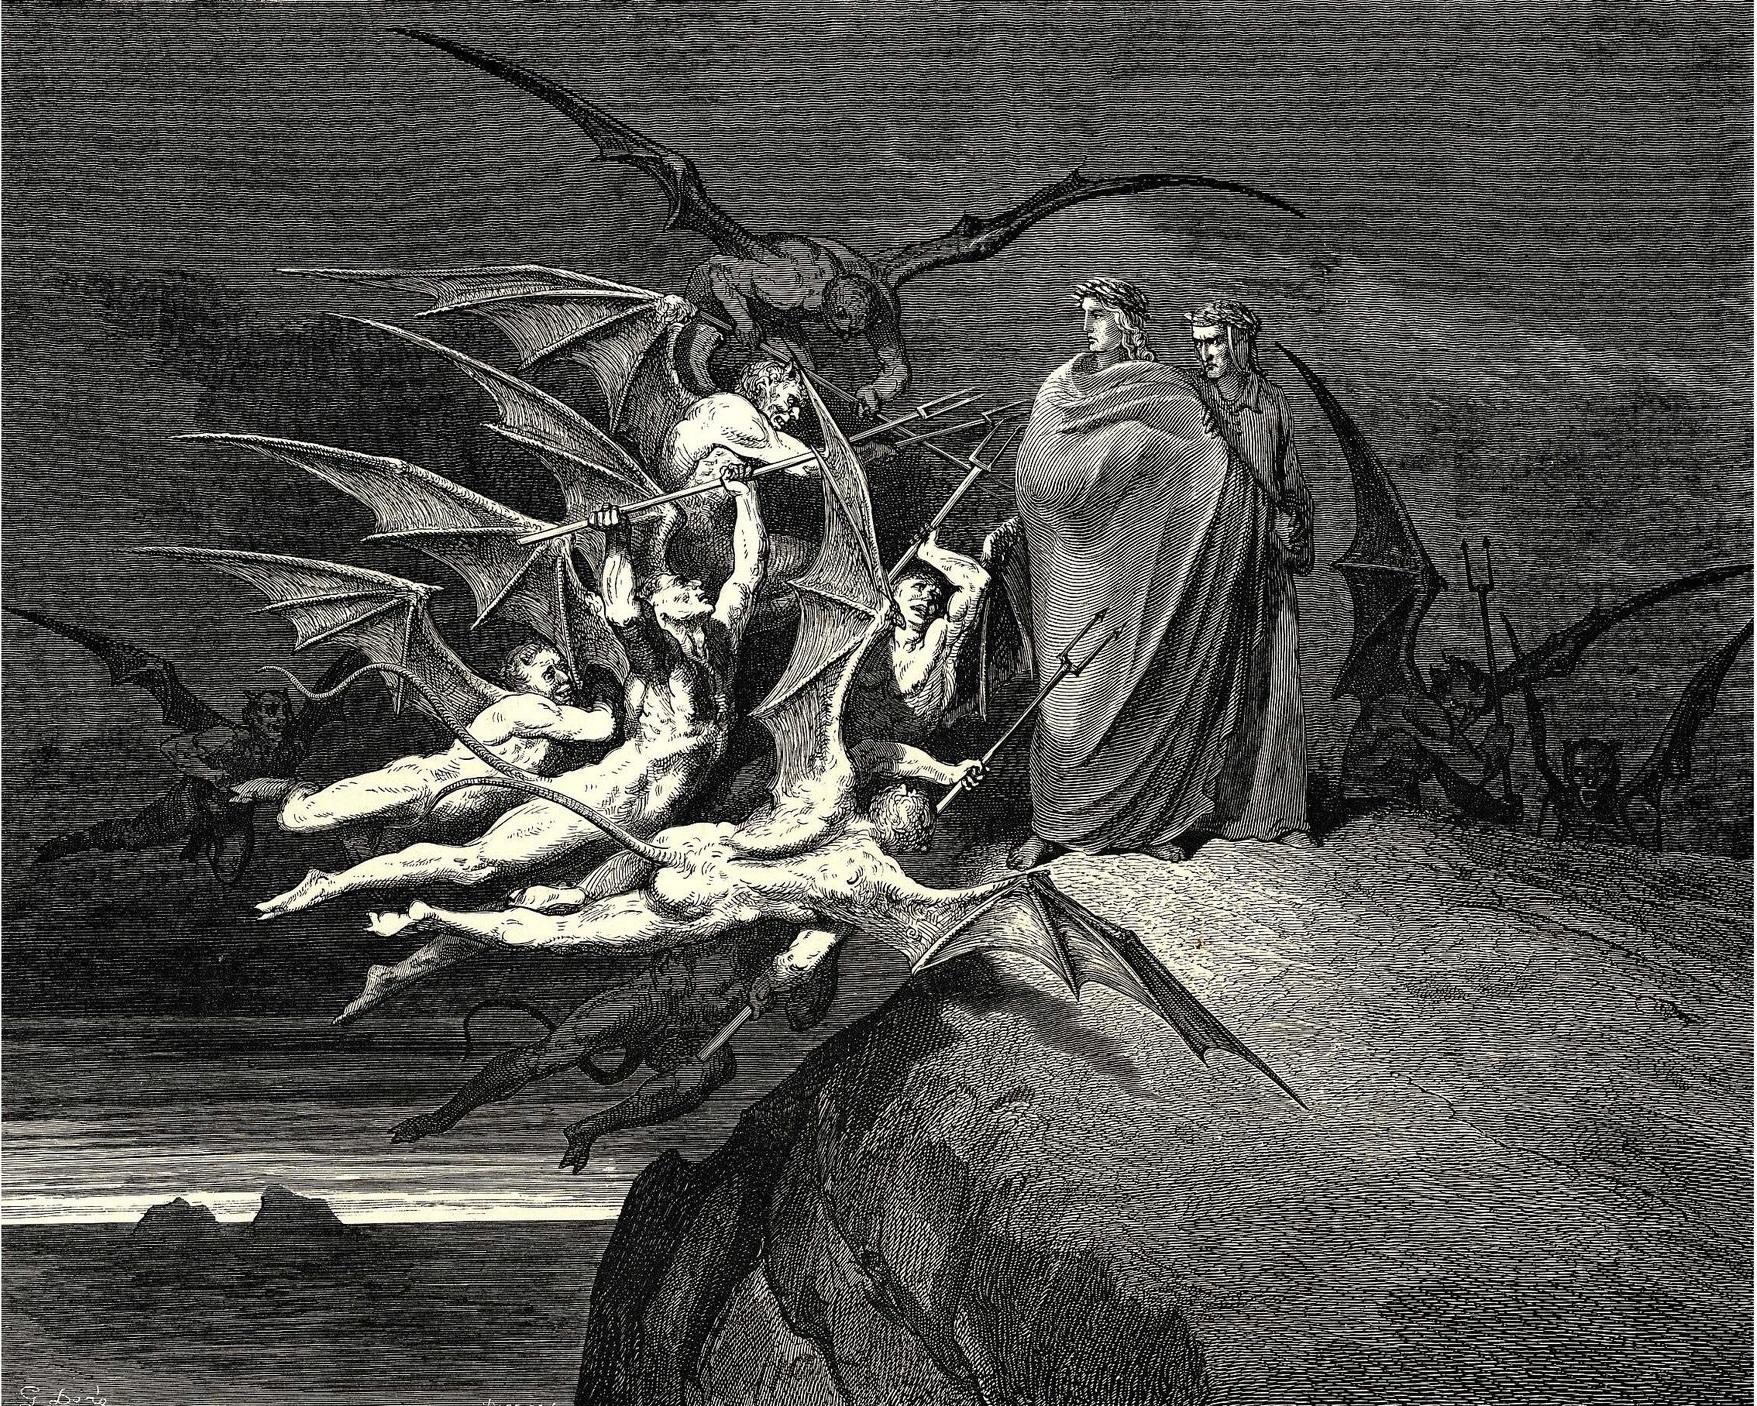 Illustrating Dante's Inferno_Infosession_Full Program_Page_28.jpg